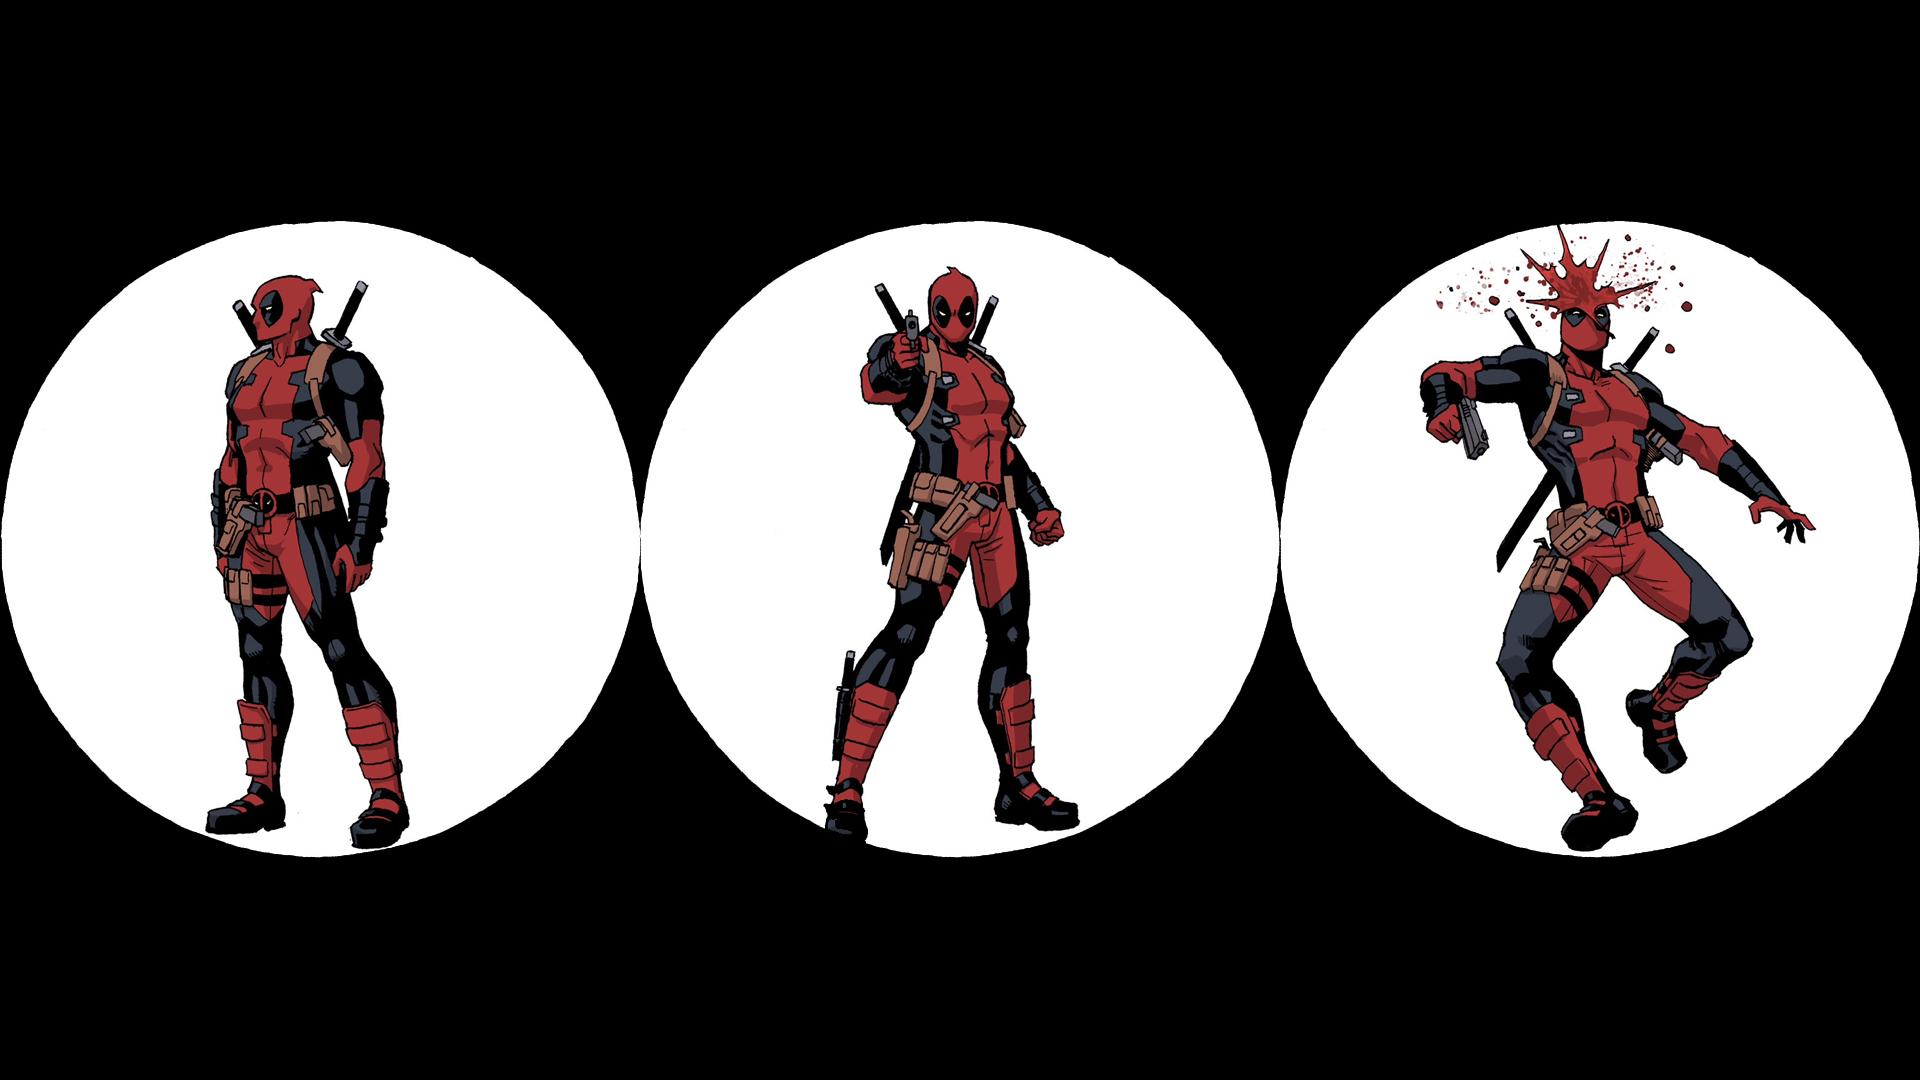 Deadpool Computer Wallpapers, Desktop Backgrounds | 1920x1080 | ID ...: wall.alphacoders.com/big.php?i=477845